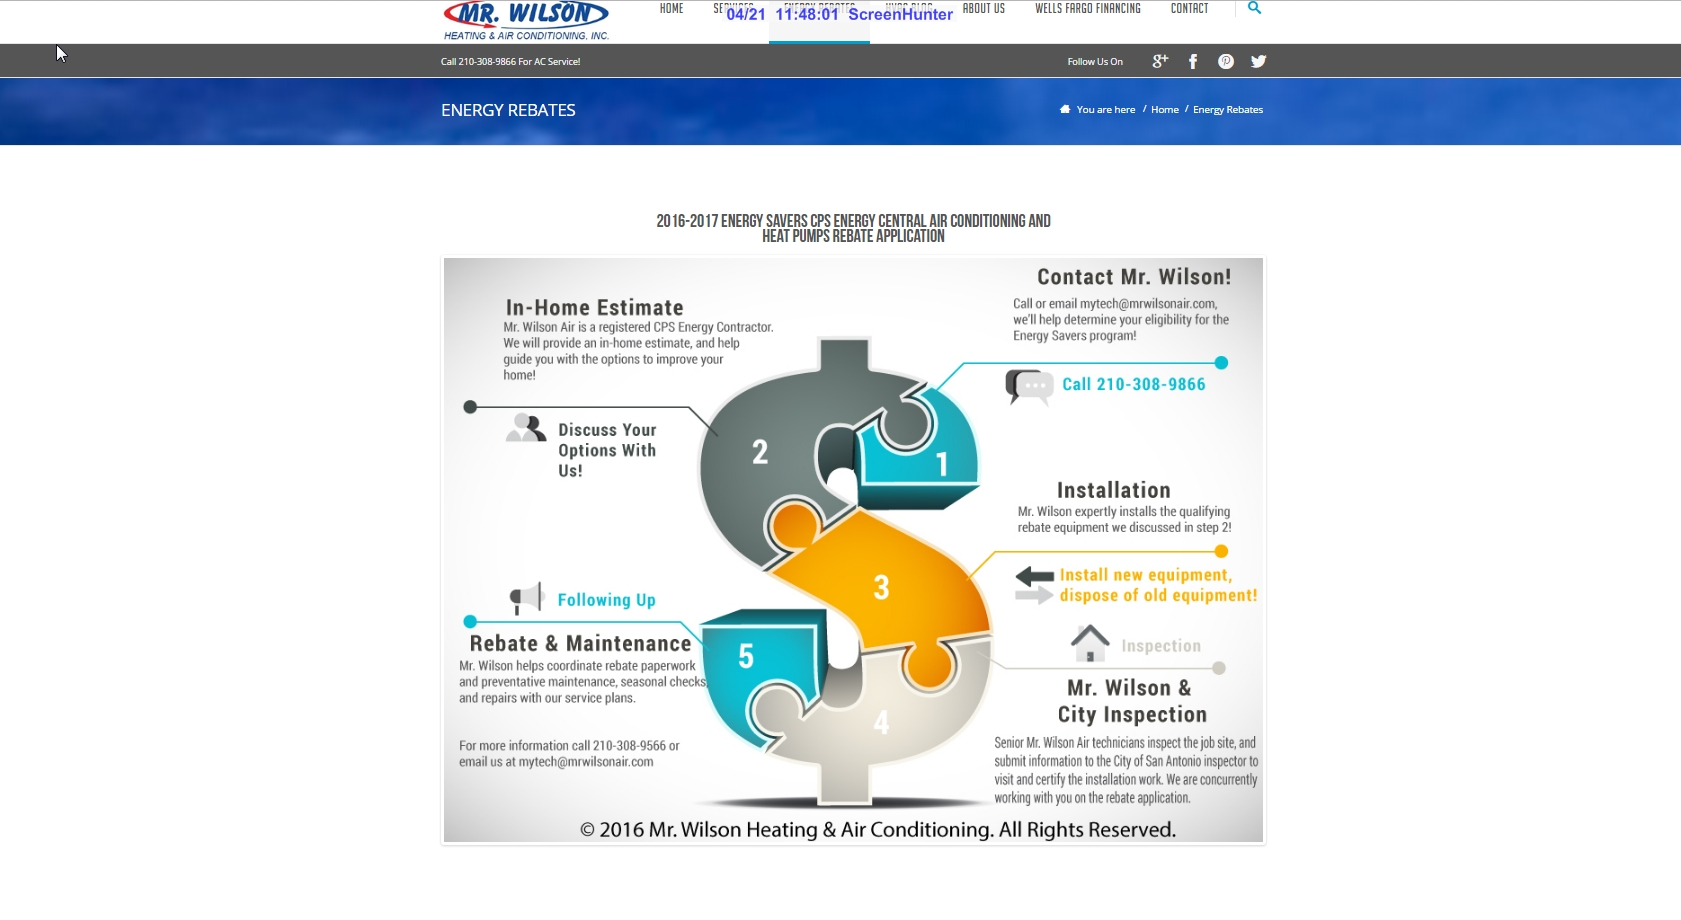 mccrossen marketing mr wilson air conditioning infographic